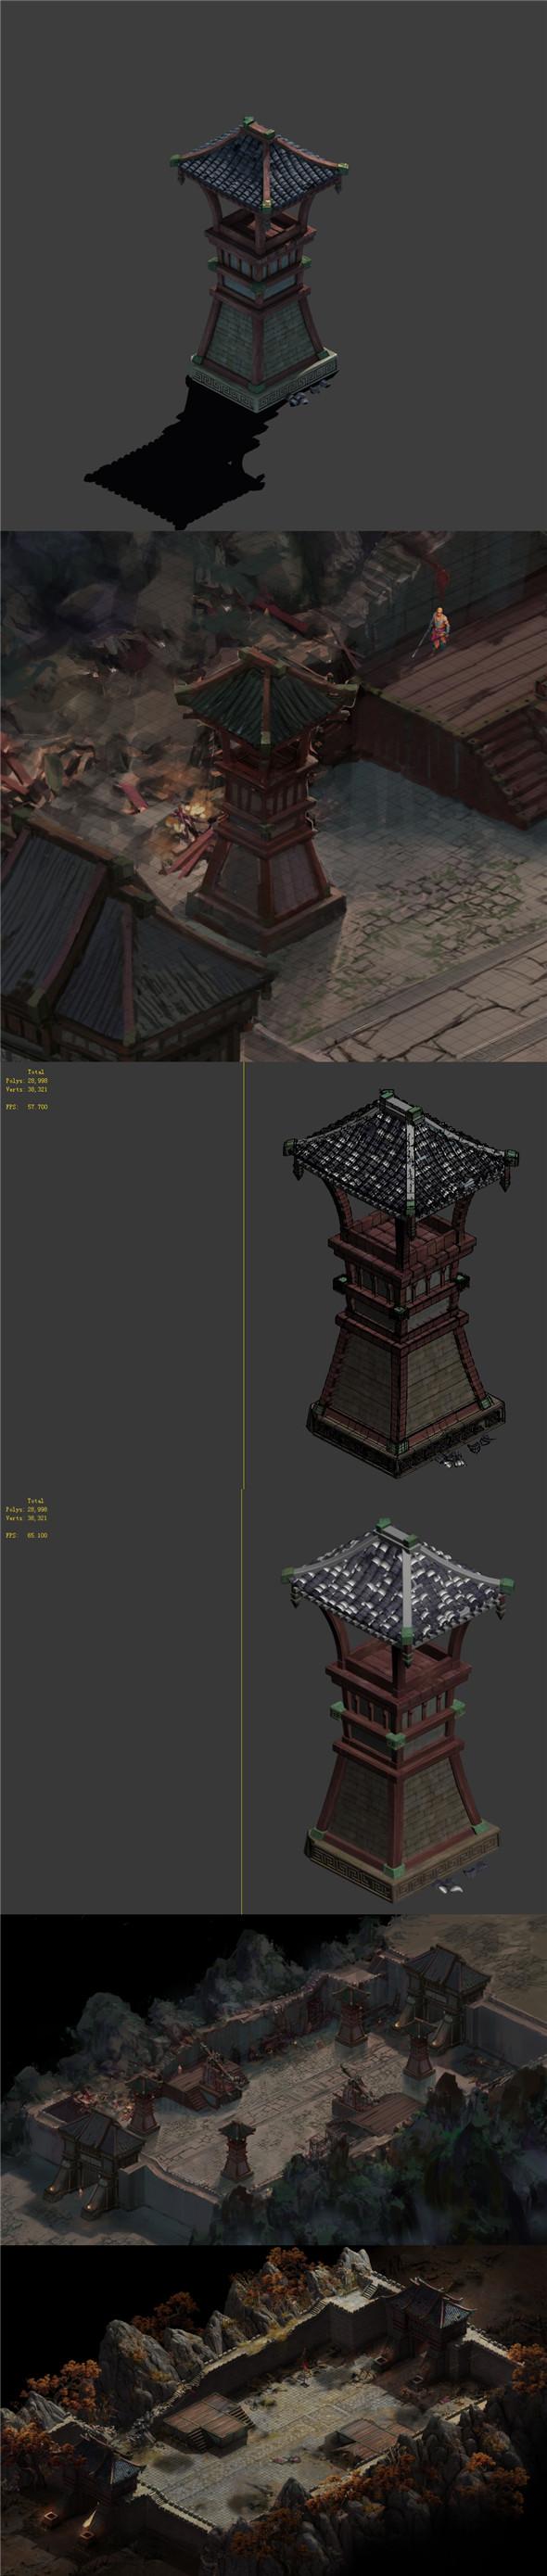 Family defense battlefield - arrow tower - 3DOcean Item for Sale